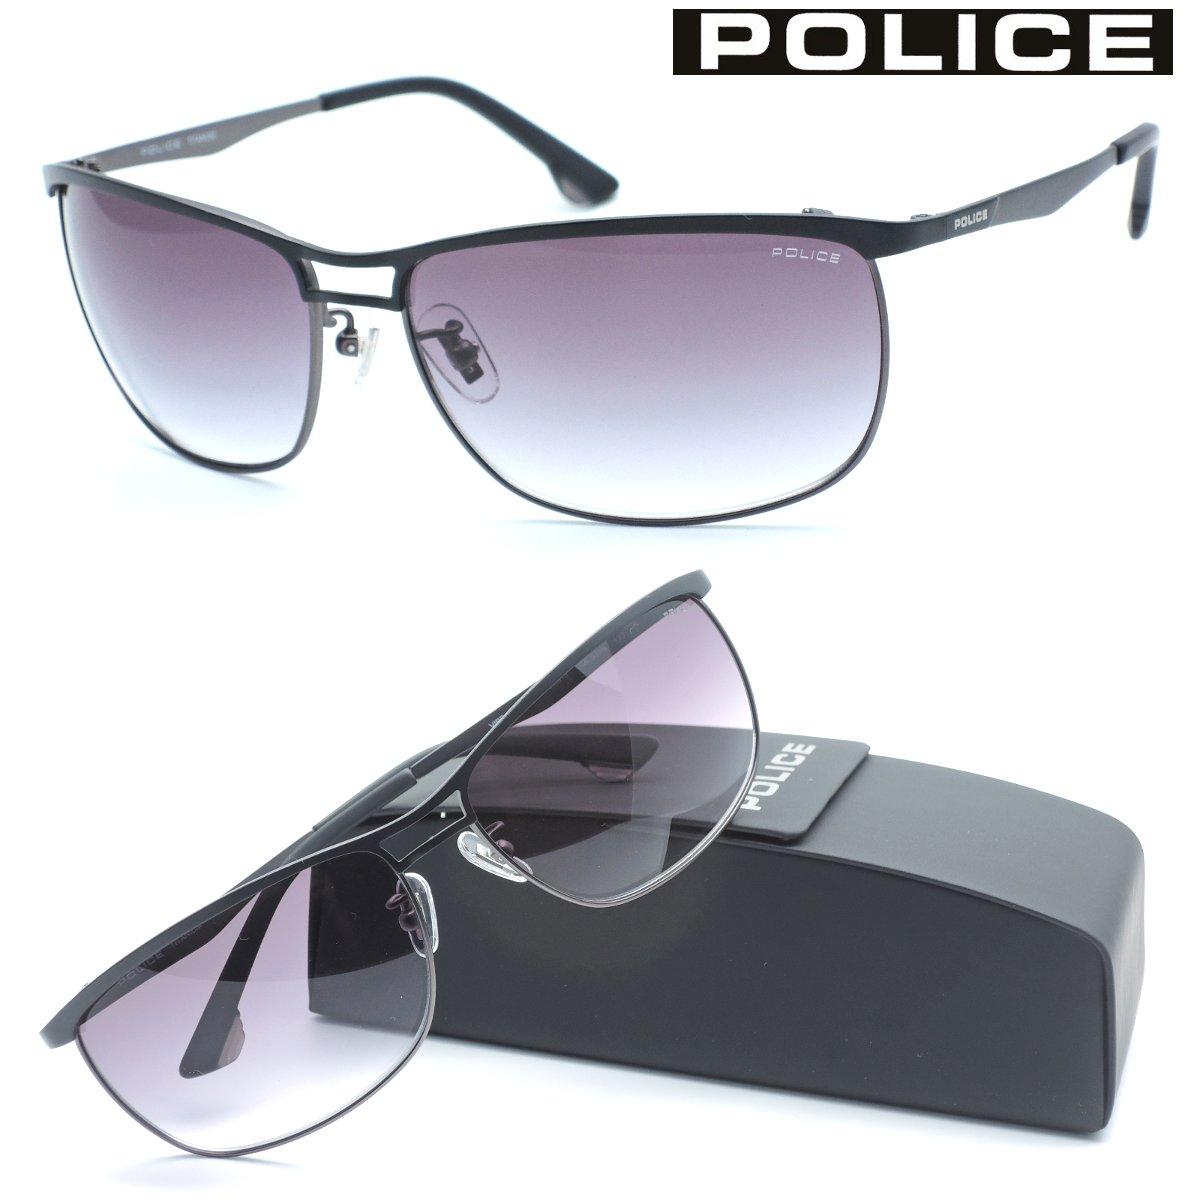 【POLICE】ポリス サングラス SPL918J col.531N【国内正規品】【店内全品送料無料】メンズ ユニセックス